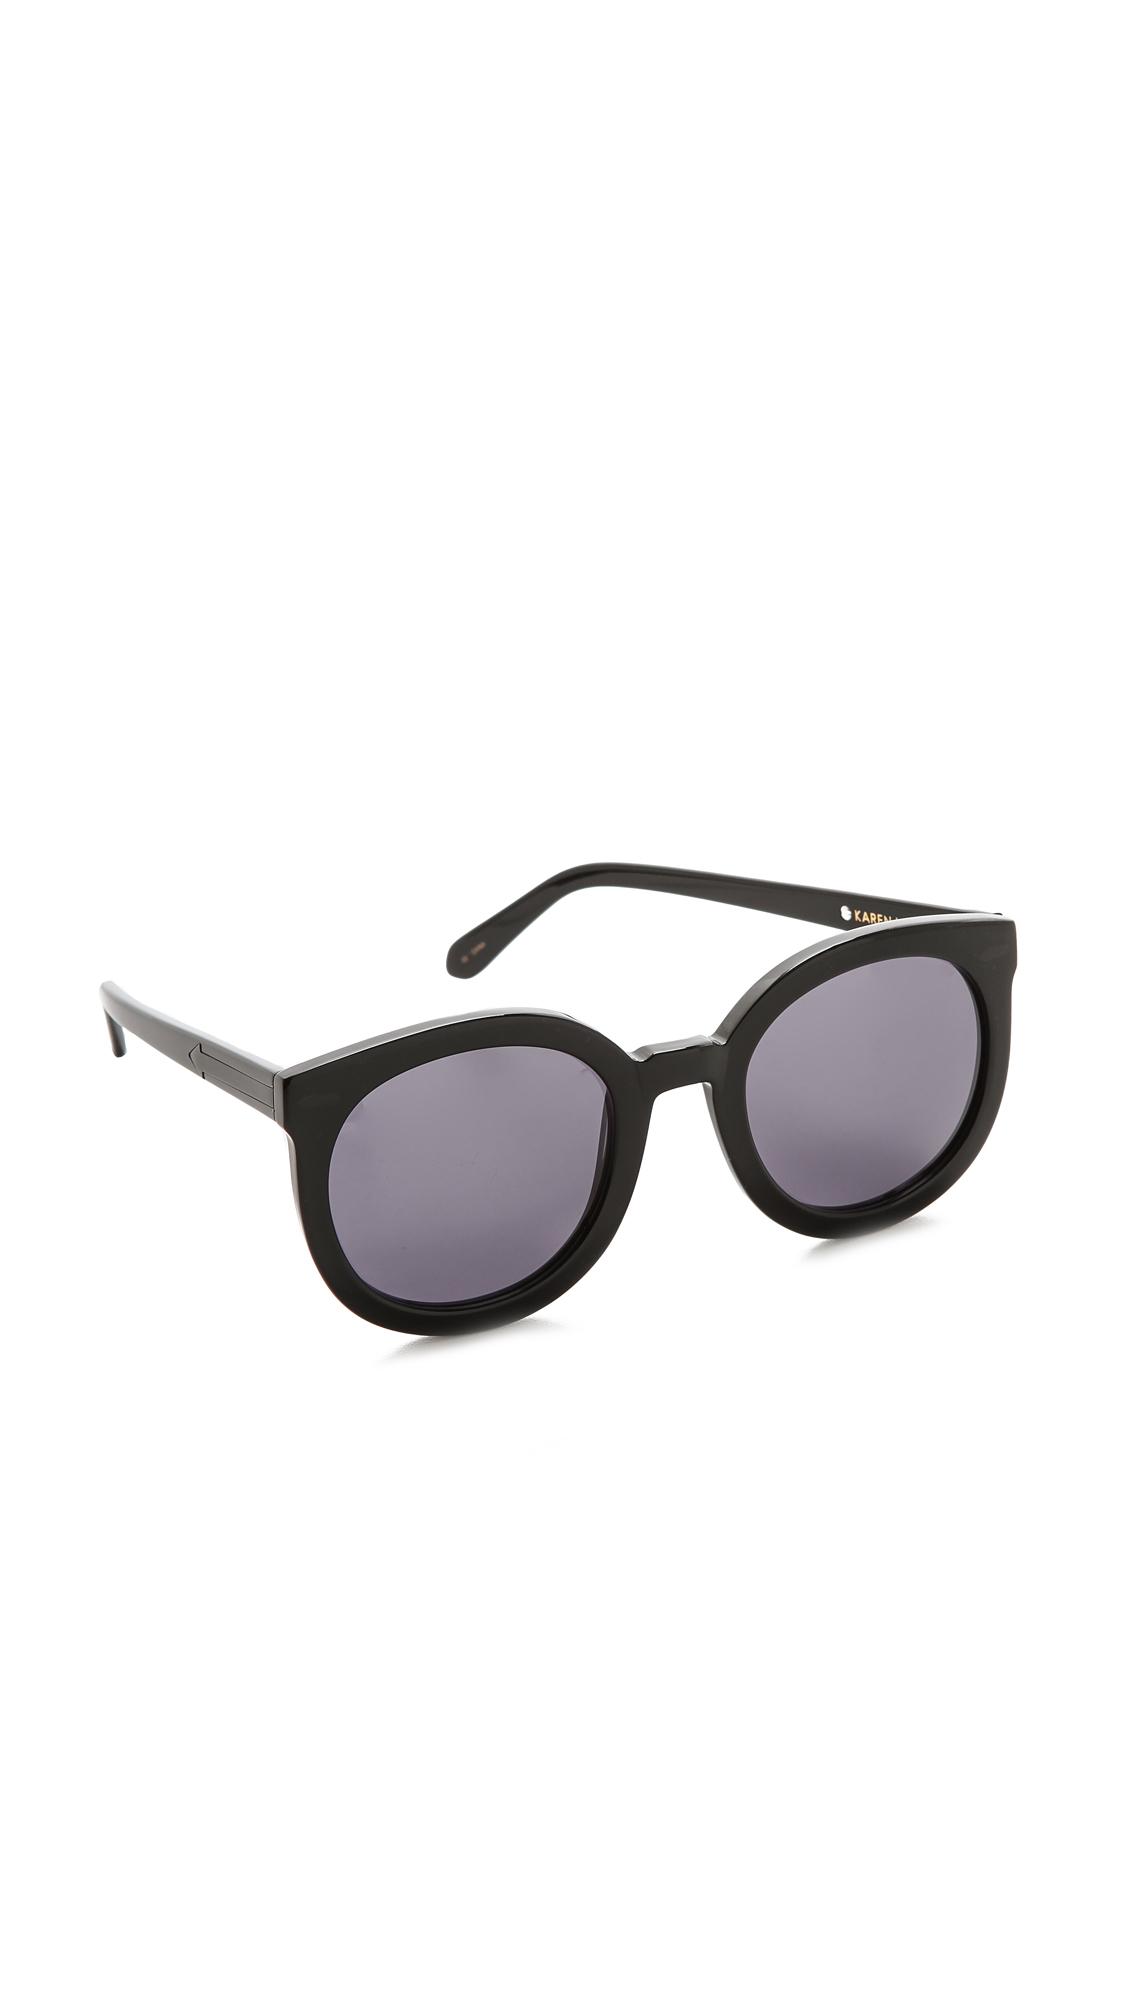 Karen Walker Super Duper Strength Sunglasses | SHOPBOP SAVE 25% use Code:FAMILY25